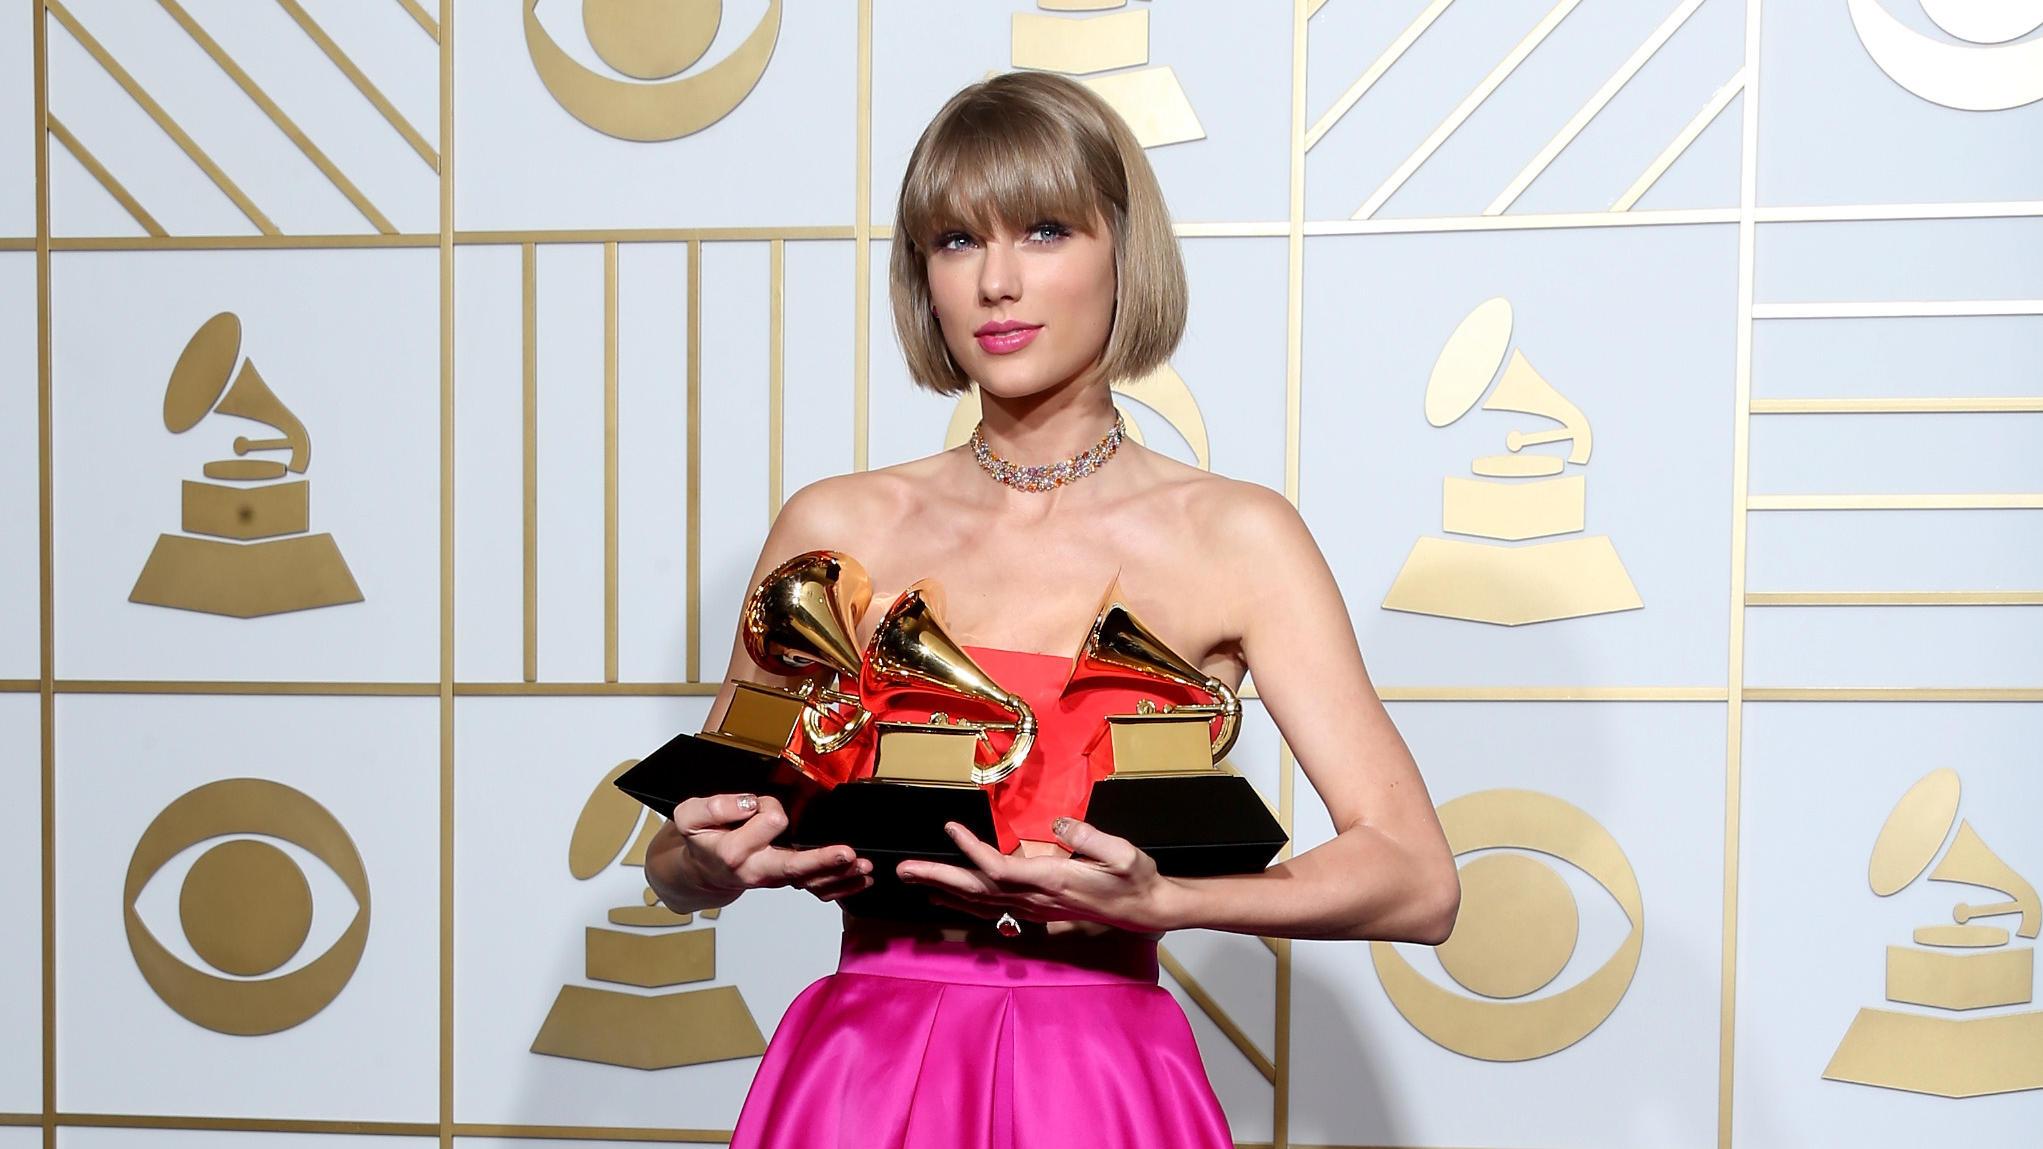 Taylor Swift And Kendrick Lamar Lead 2016 Grammy Awards Connecticut Public Radio